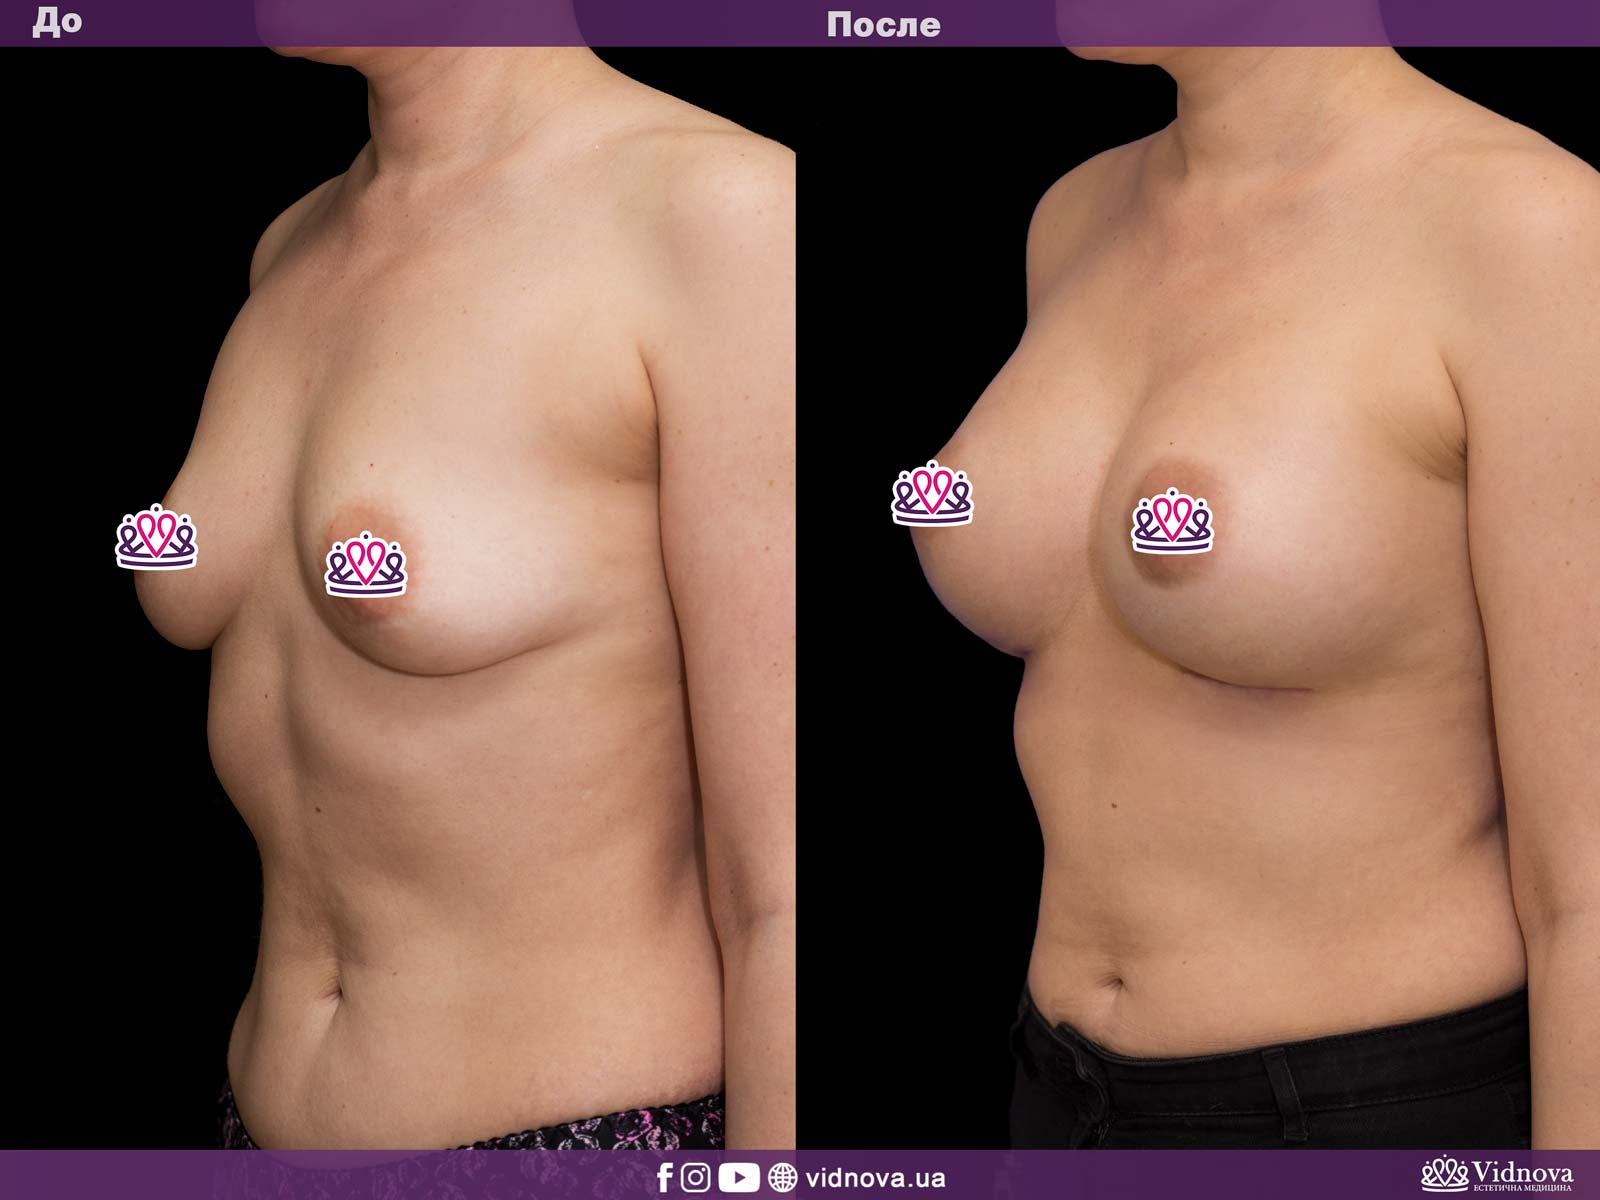 Увеличение груди: Фото ДО и ПОСЛЕ - Пример №36-2 - Клиника Vidnova